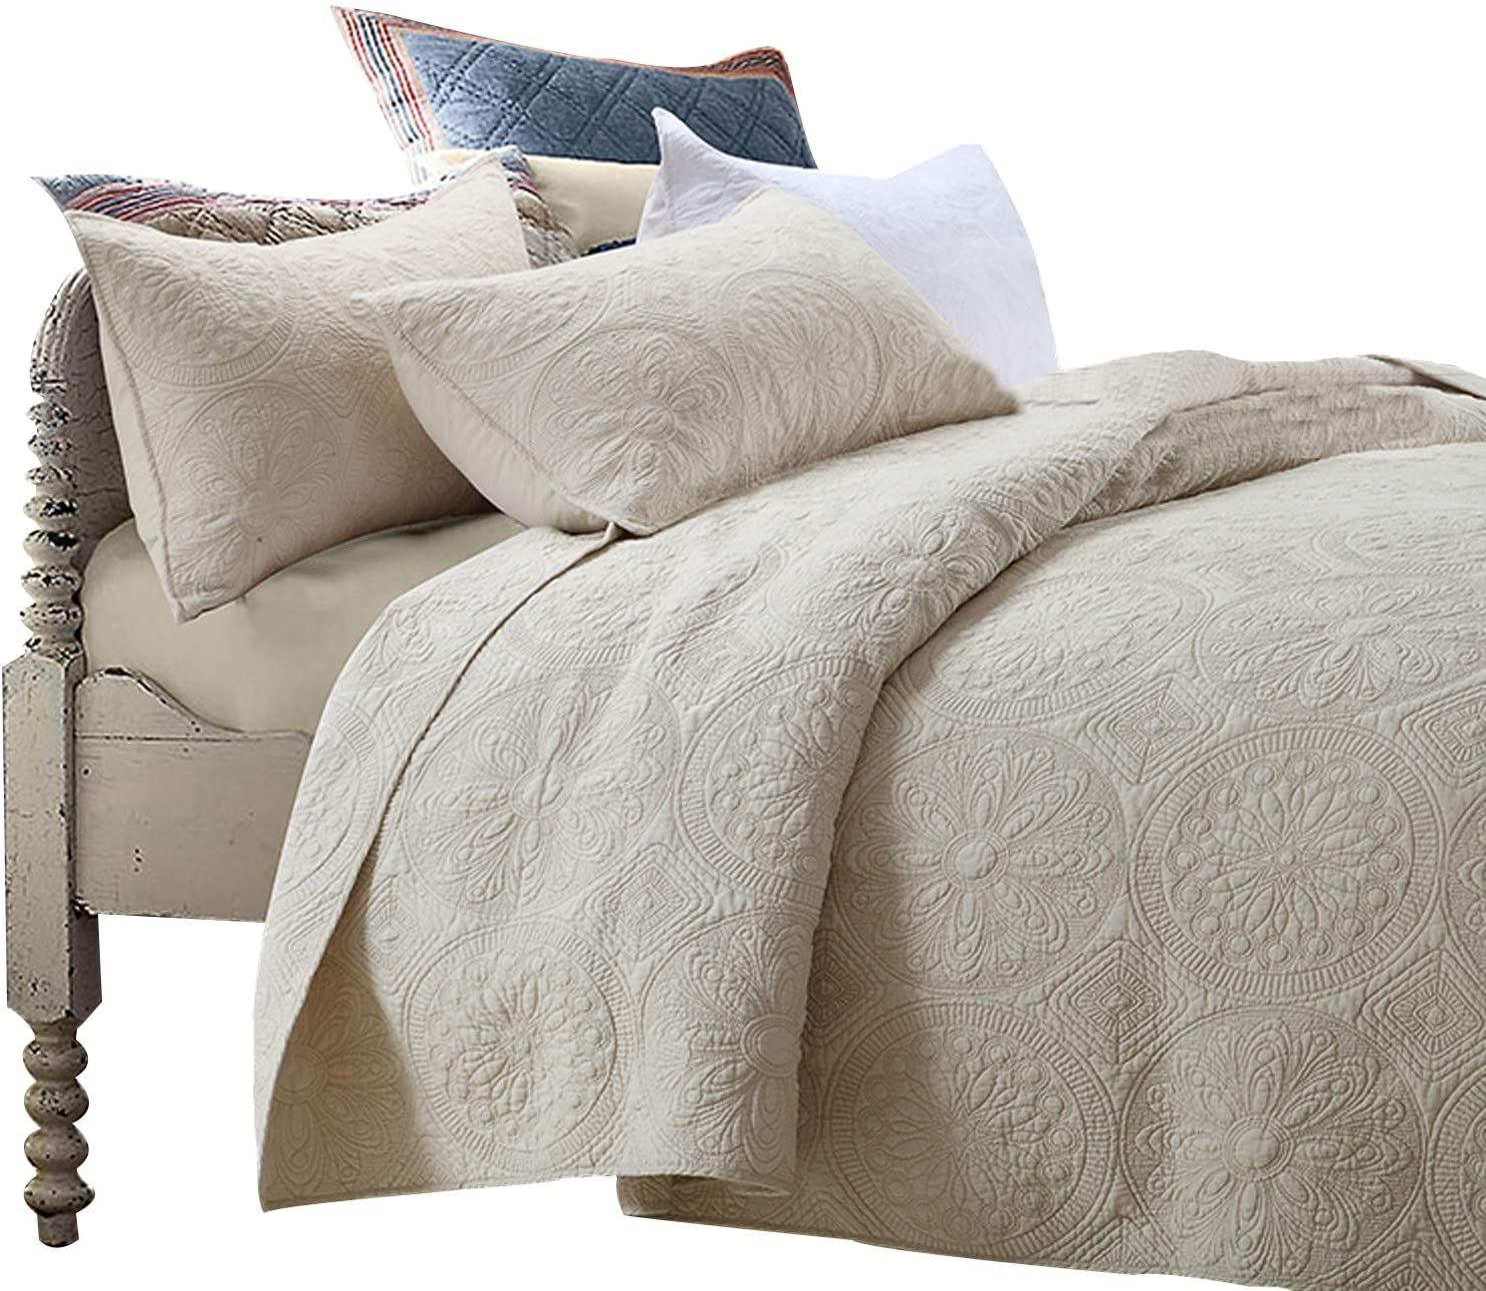 Brandream Luxury Beige Bedding Set Q Bedspread Oversized Super-cheap 3 Piece Ranking TOP18